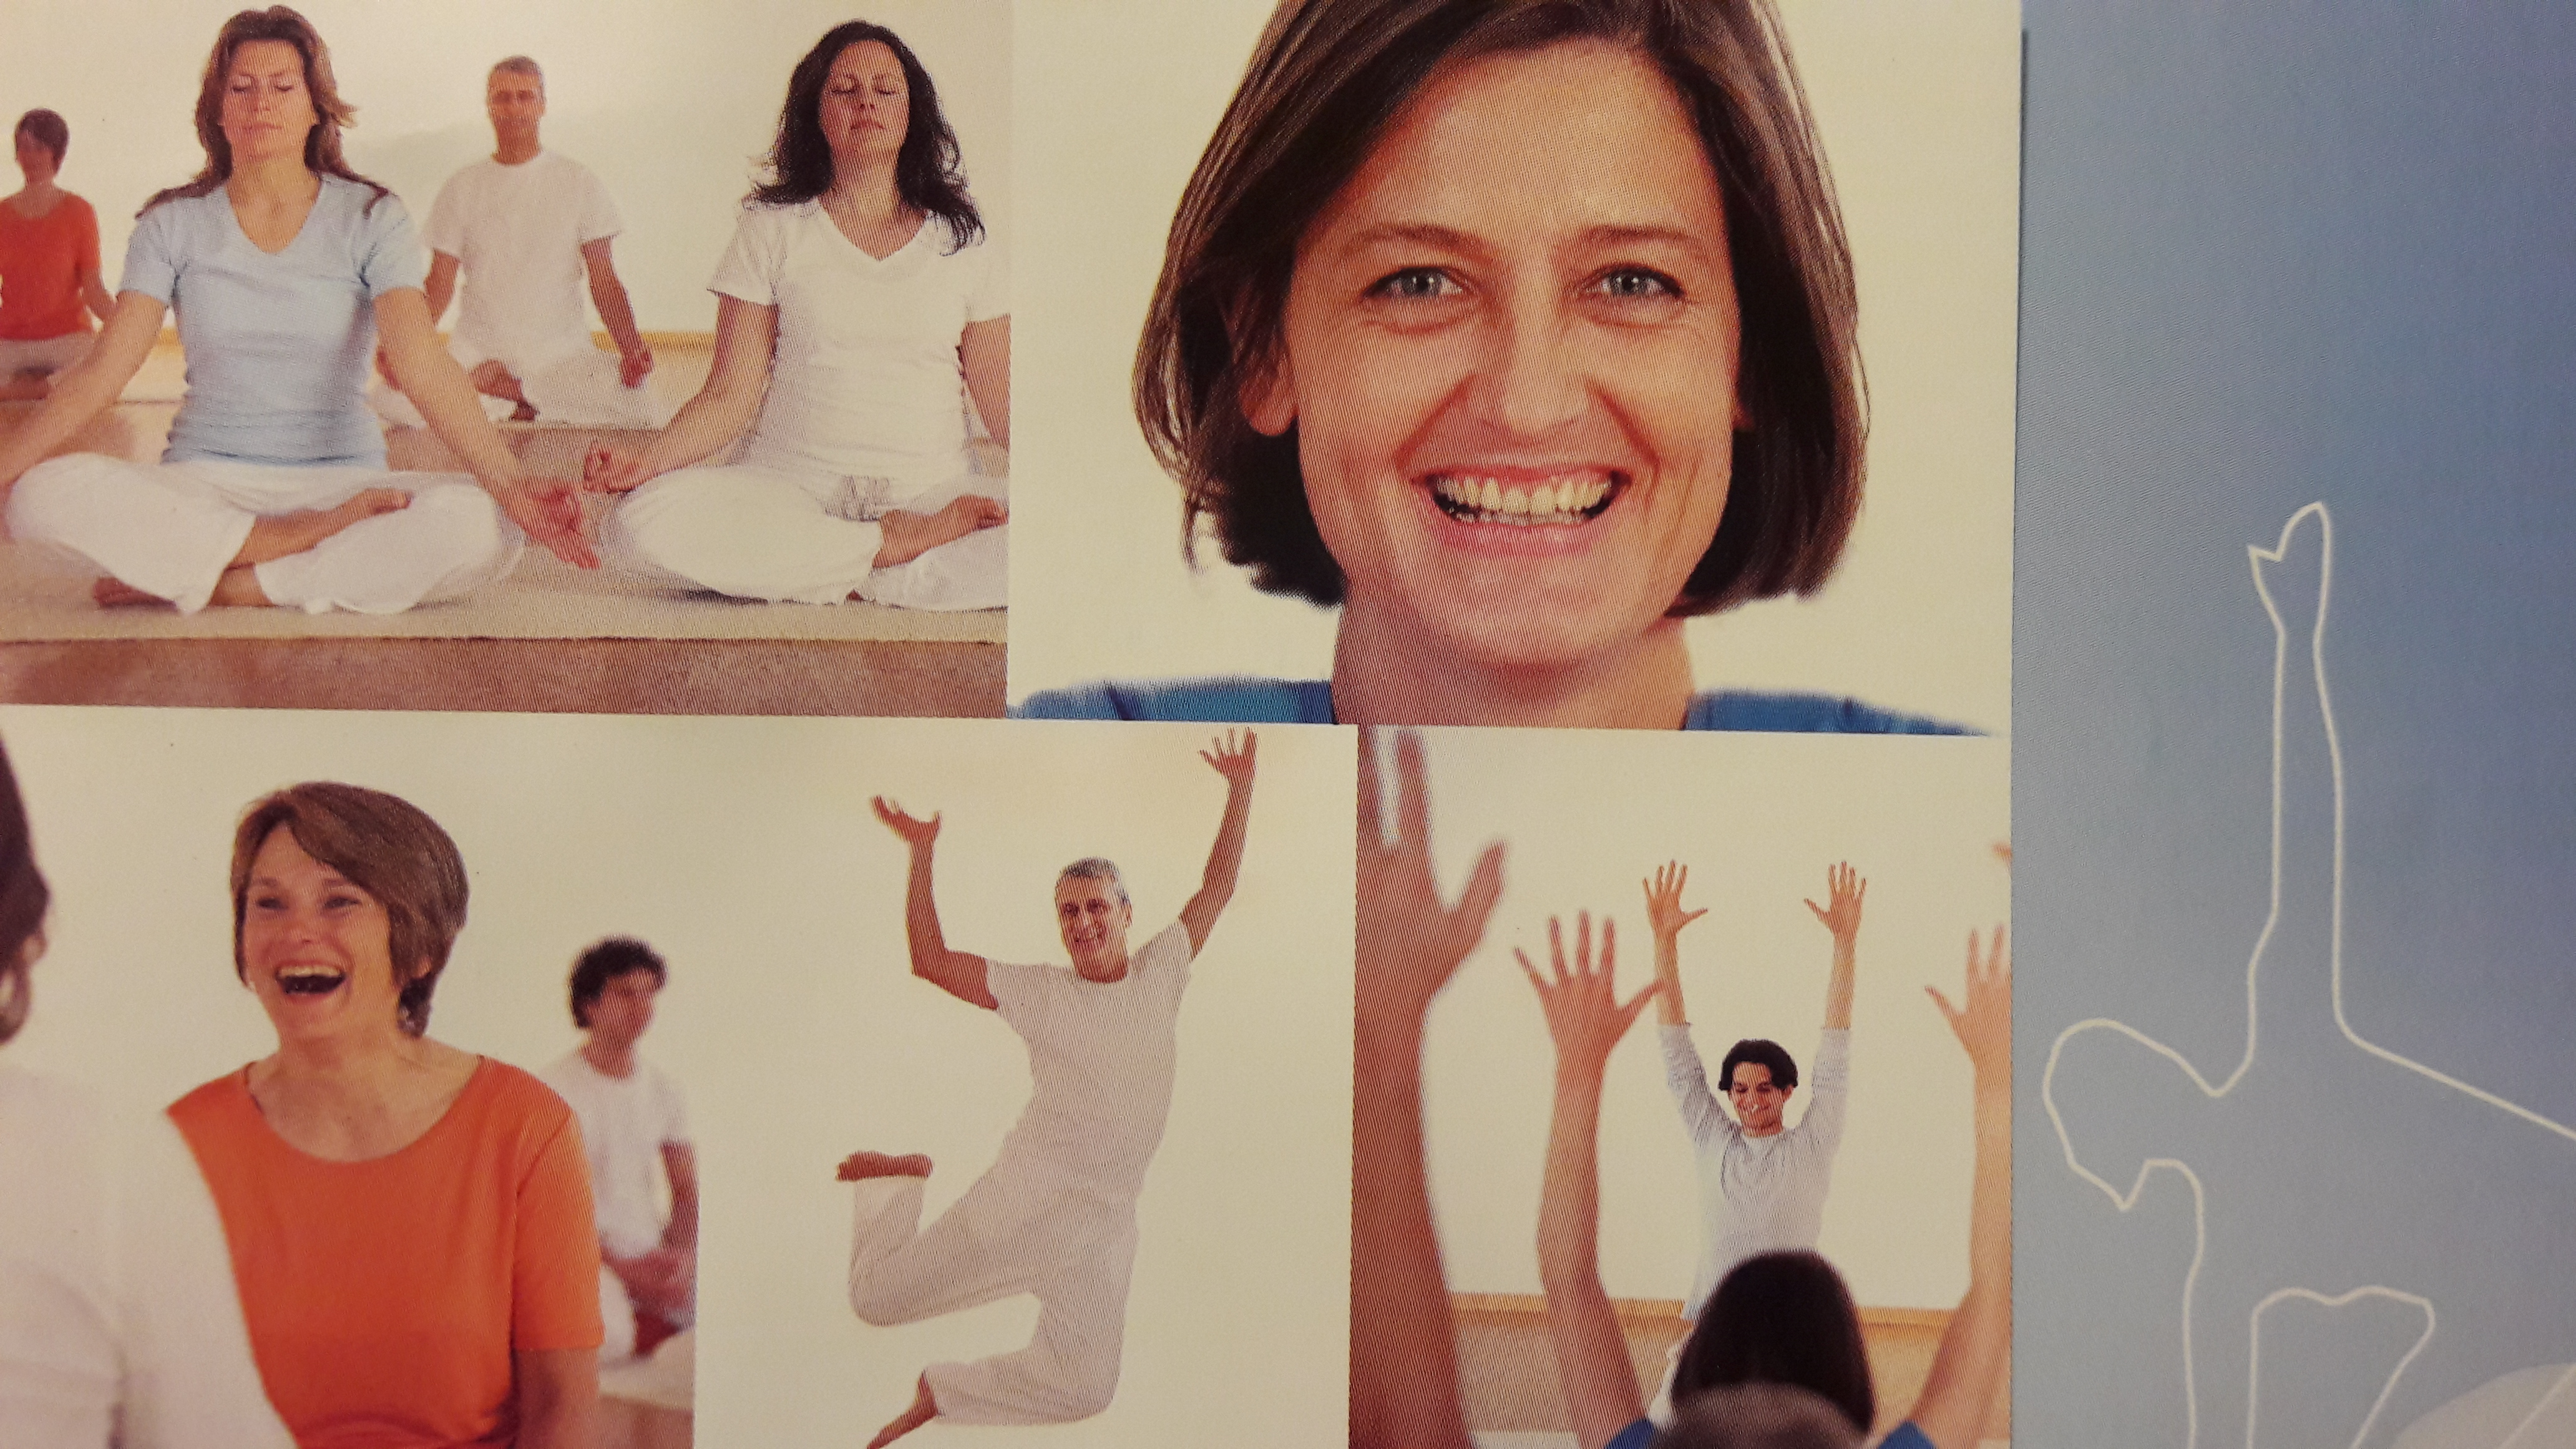 happiness kurs yoga meditation atemtechnik in hamburg am art of living happiness. Black Bedroom Furniture Sets. Home Design Ideas